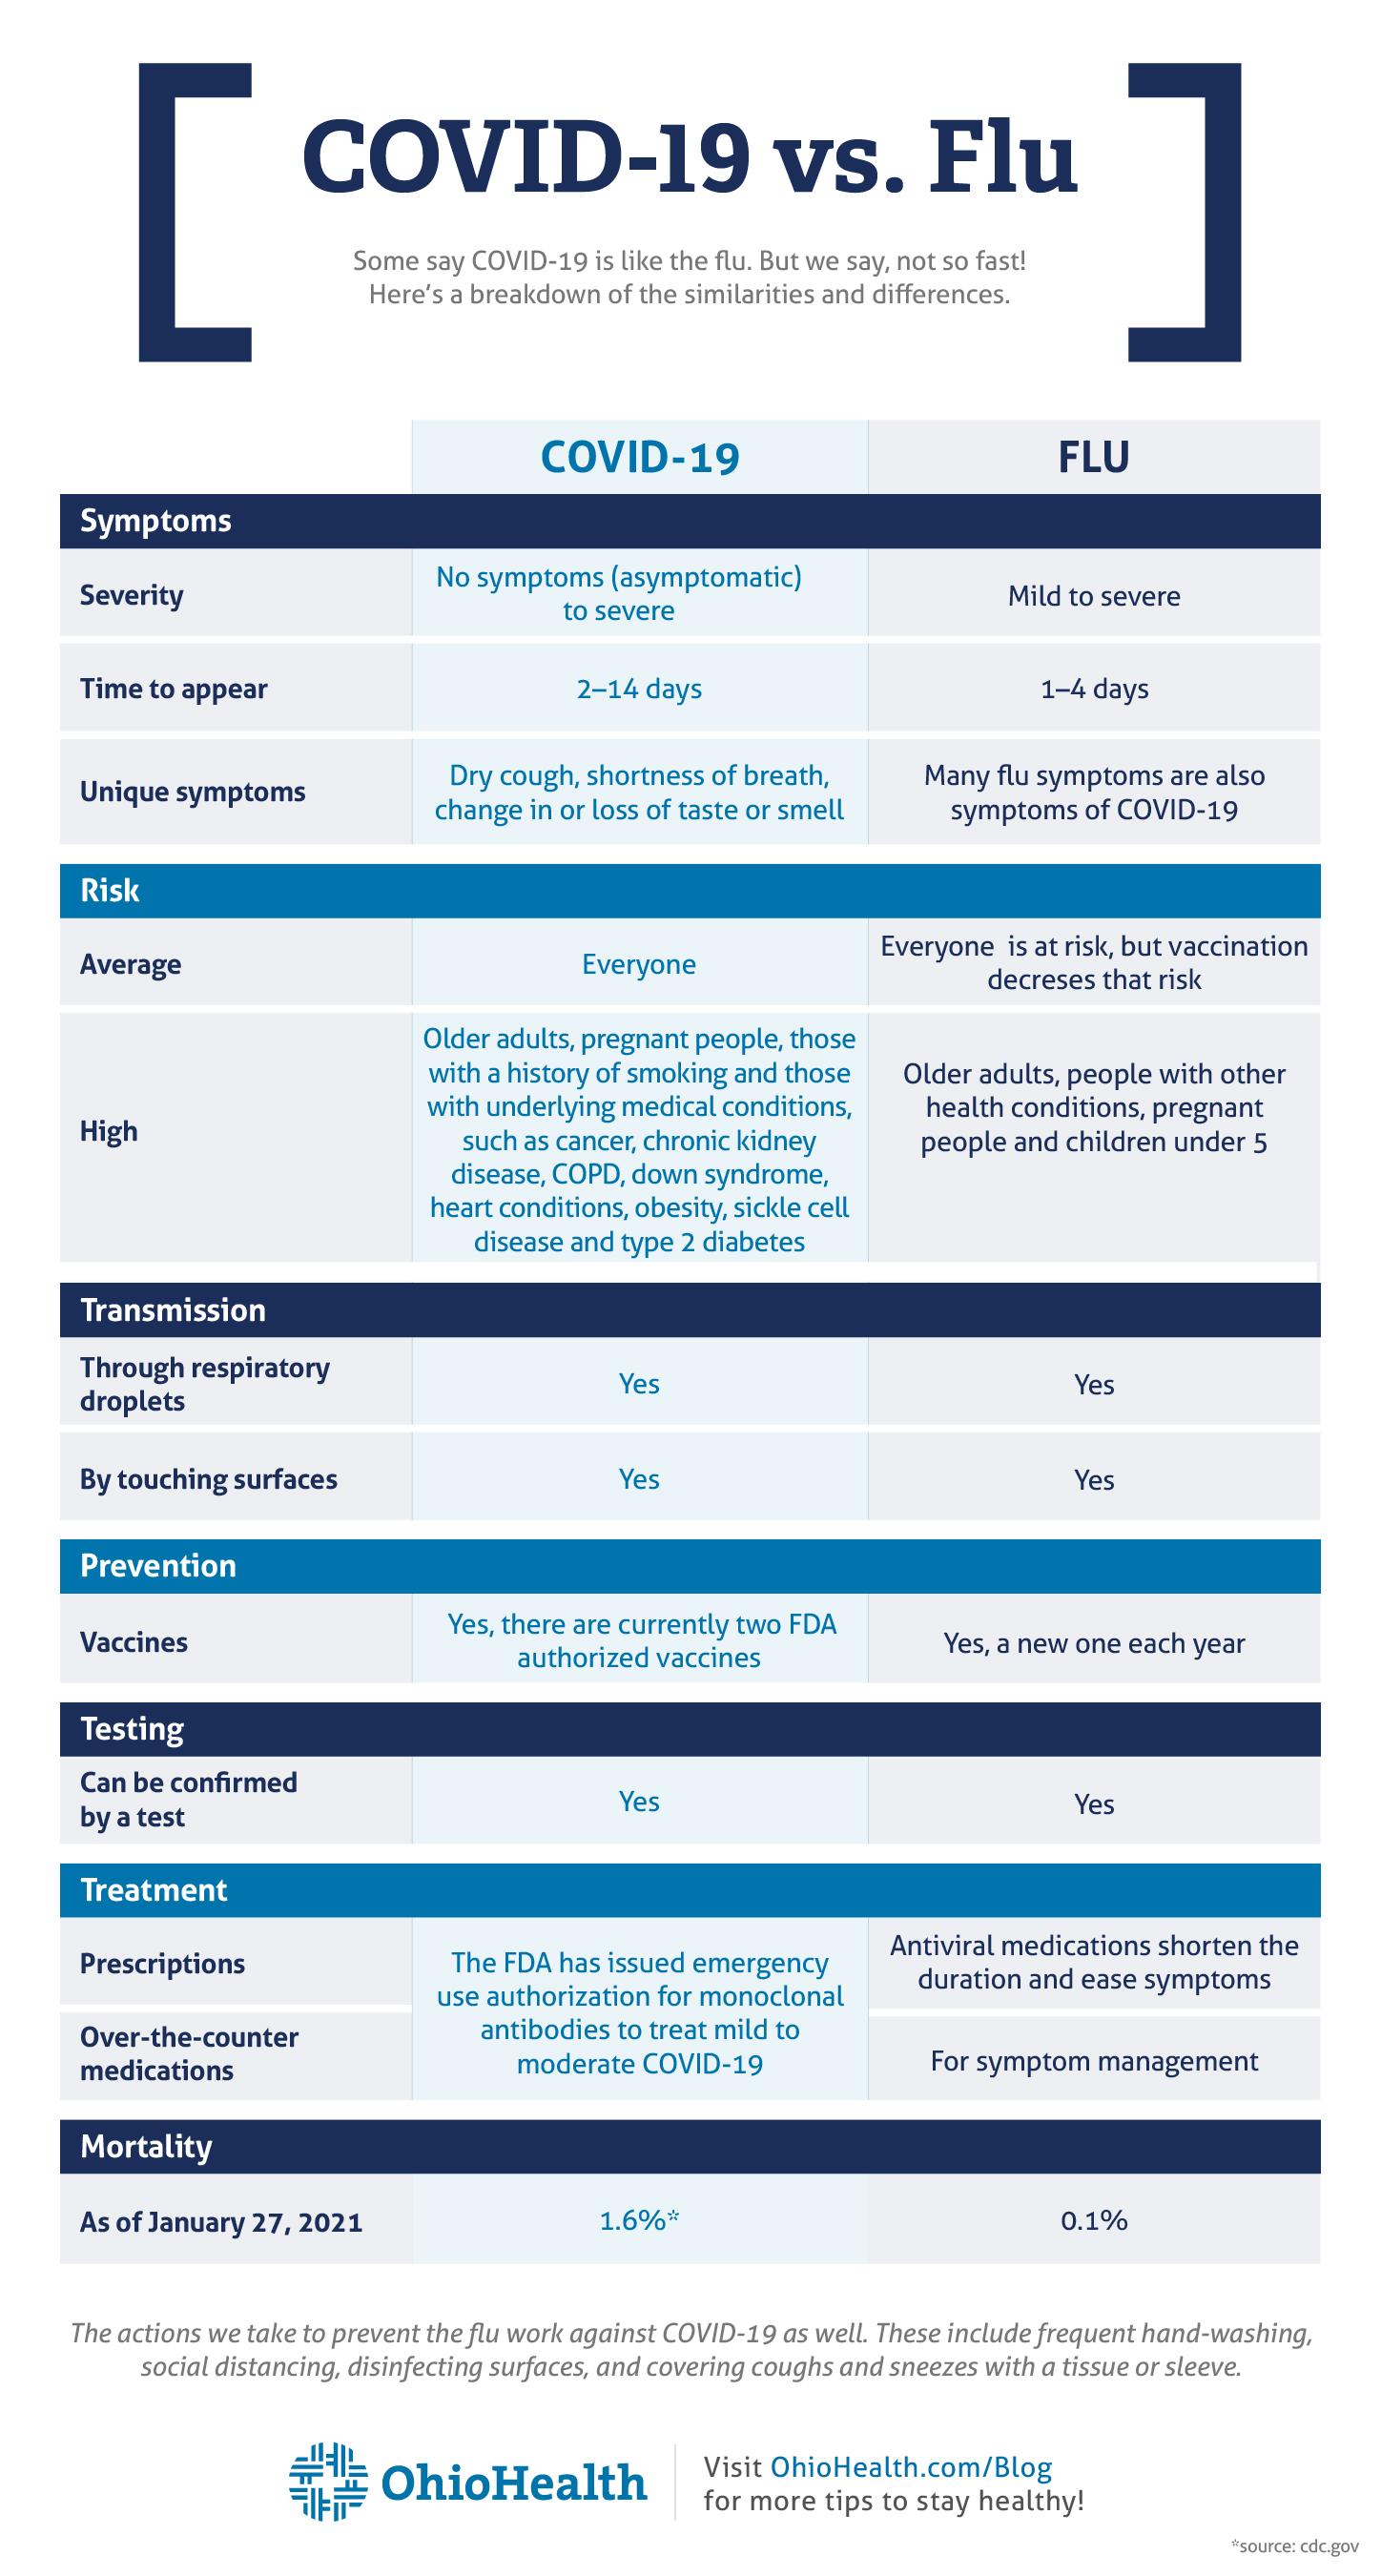 Covid-19 vs. Flu Infographic